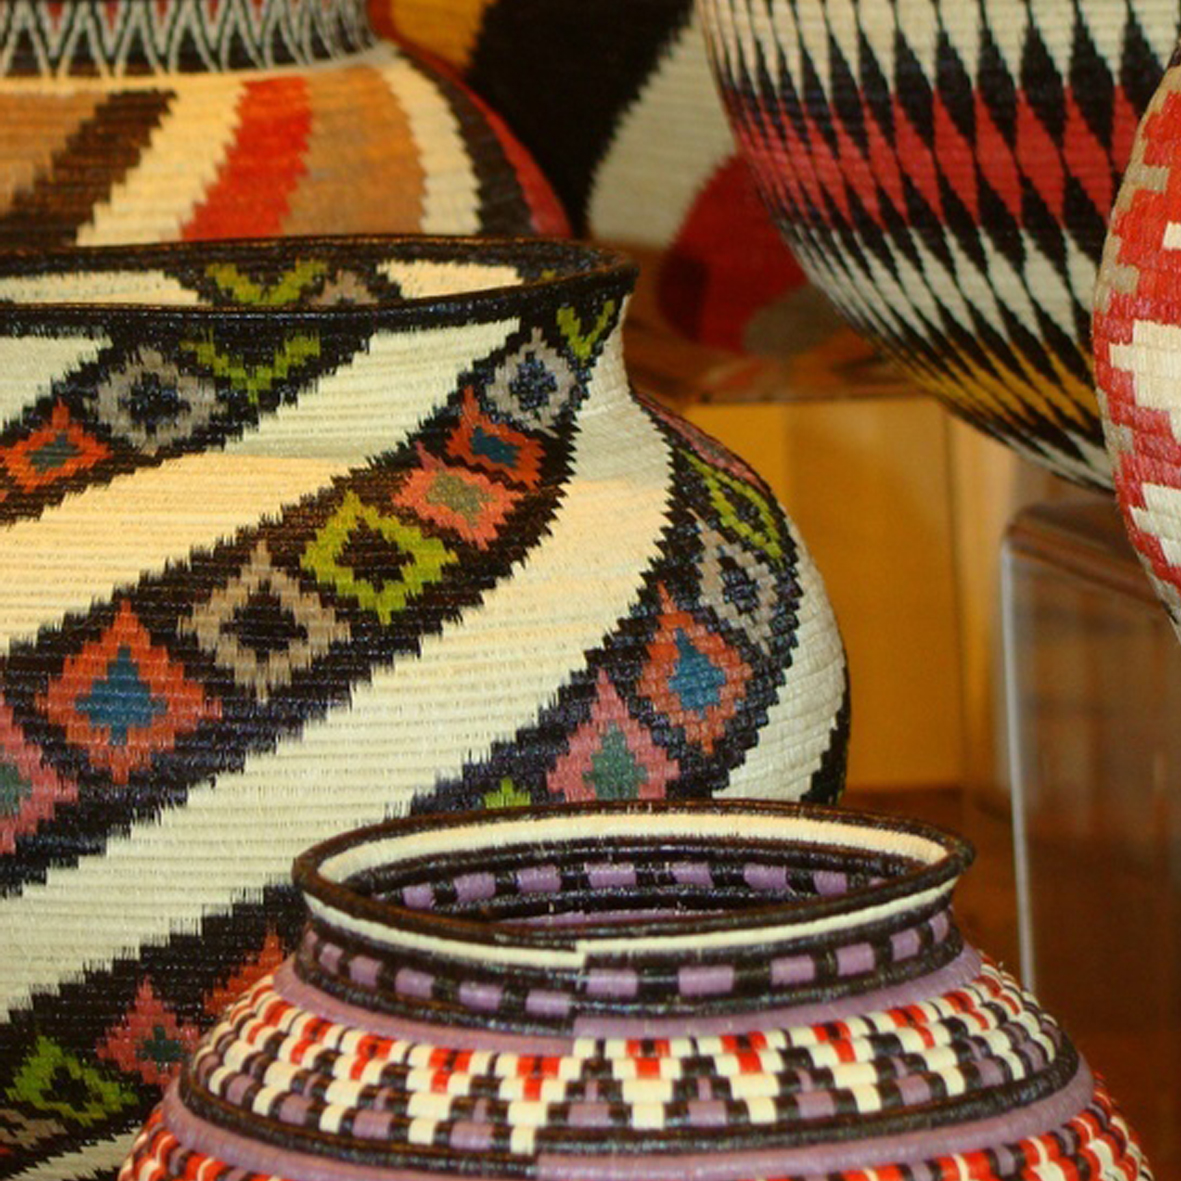 Basket Weaving Name : Iheartprintsandpatterns african basket weaving